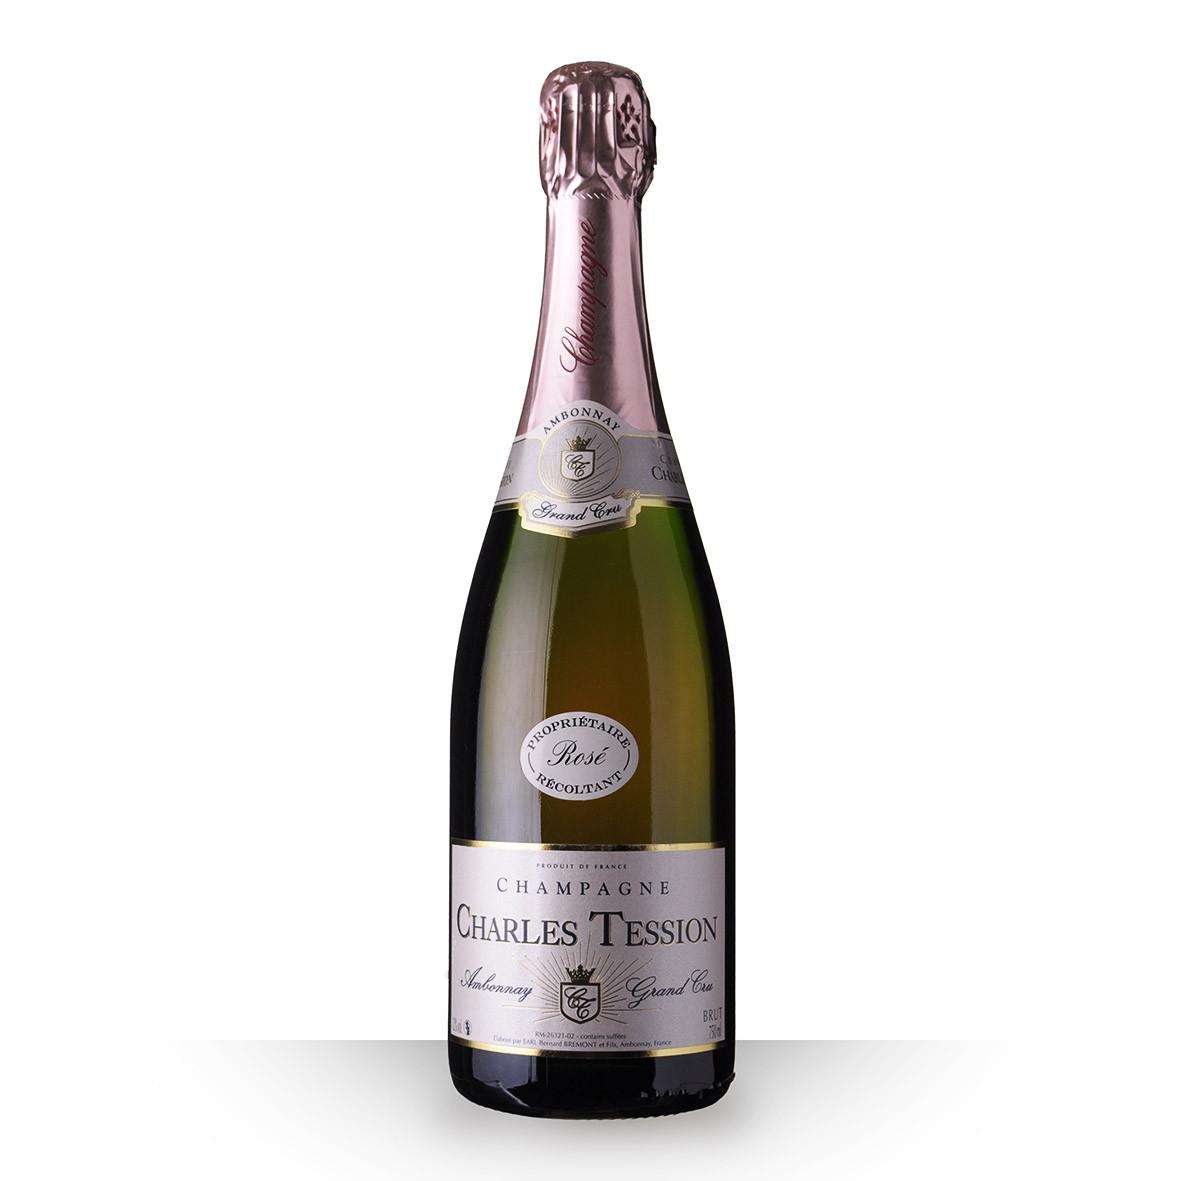 Champagne Charles Tession Brut Rosé 75cl Grand Cru www.odyssee-vins.com